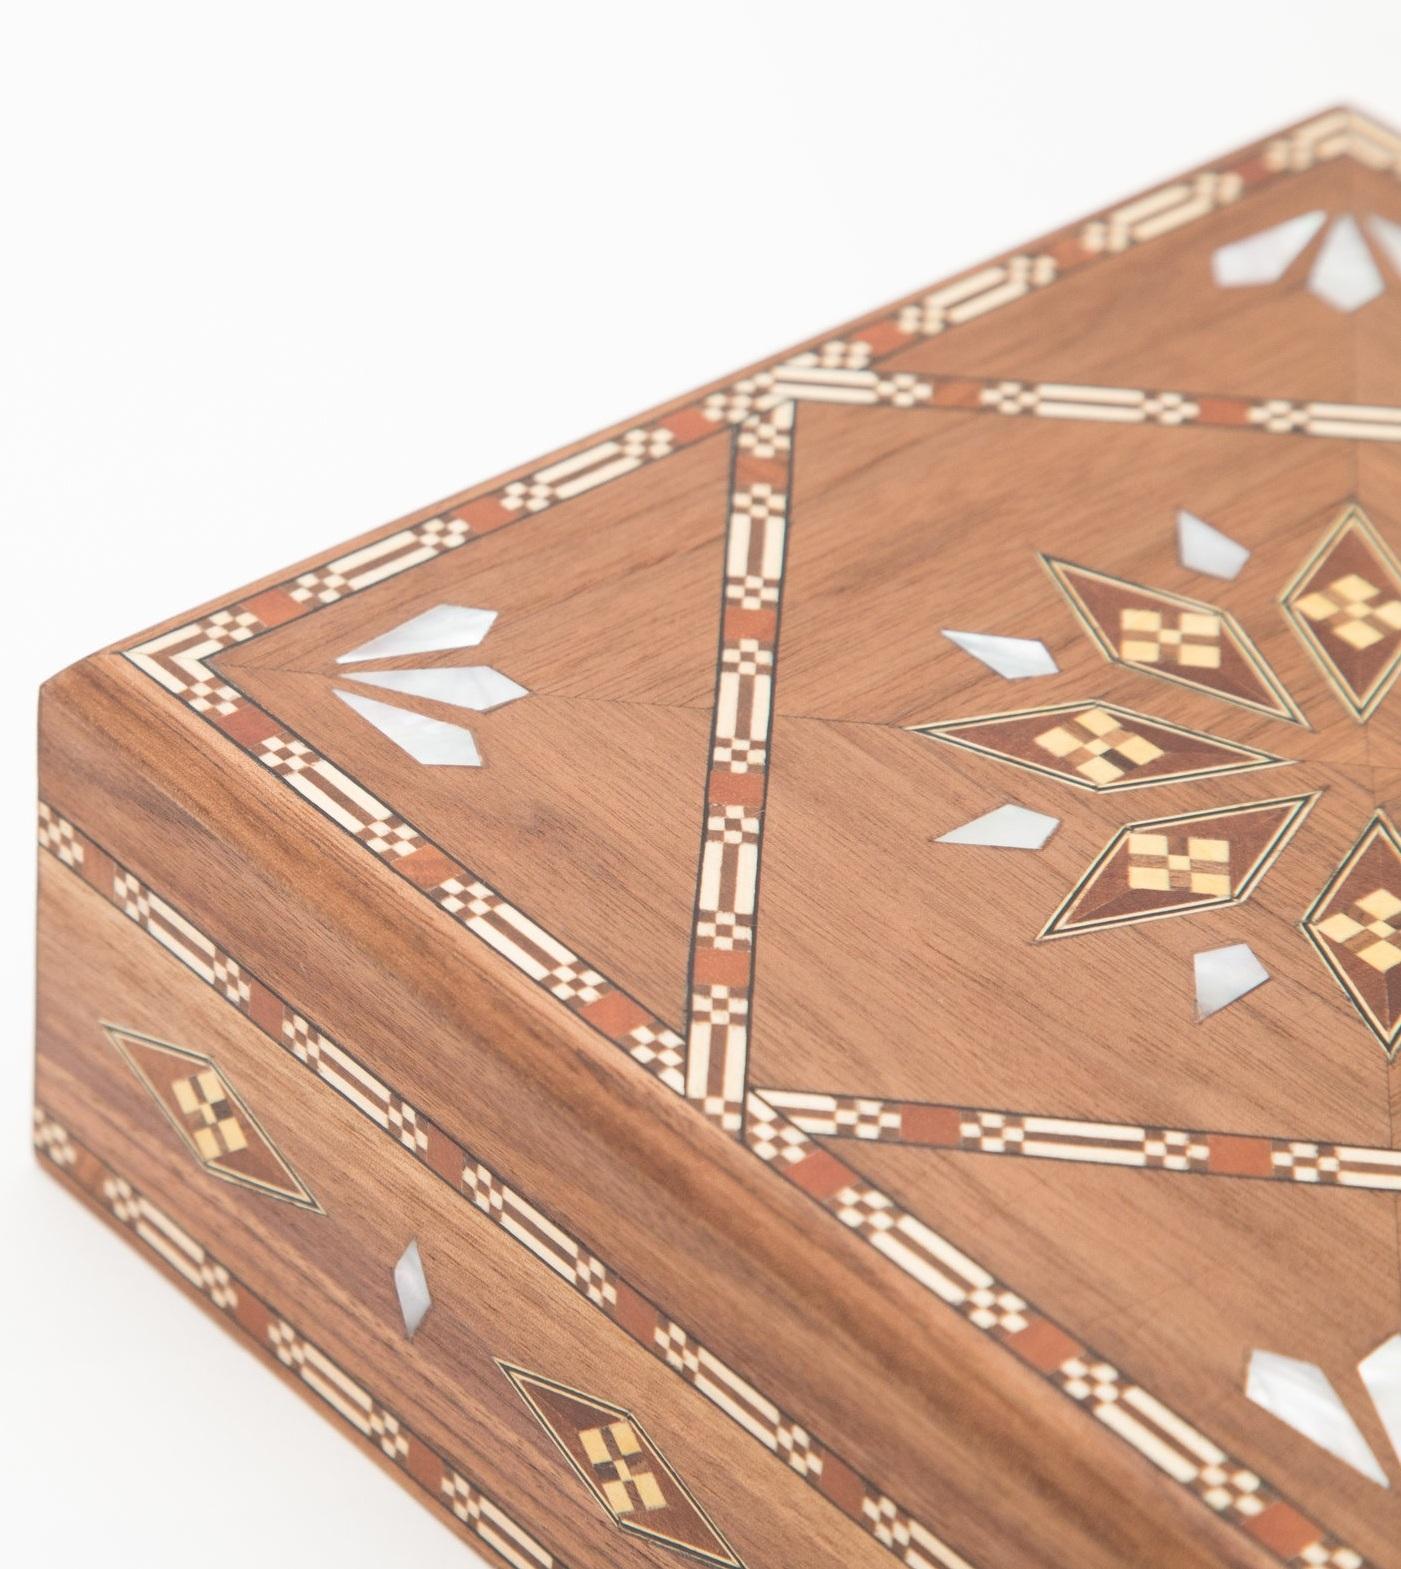 The  Square Damascene Box  with geometric mosaic inlay.